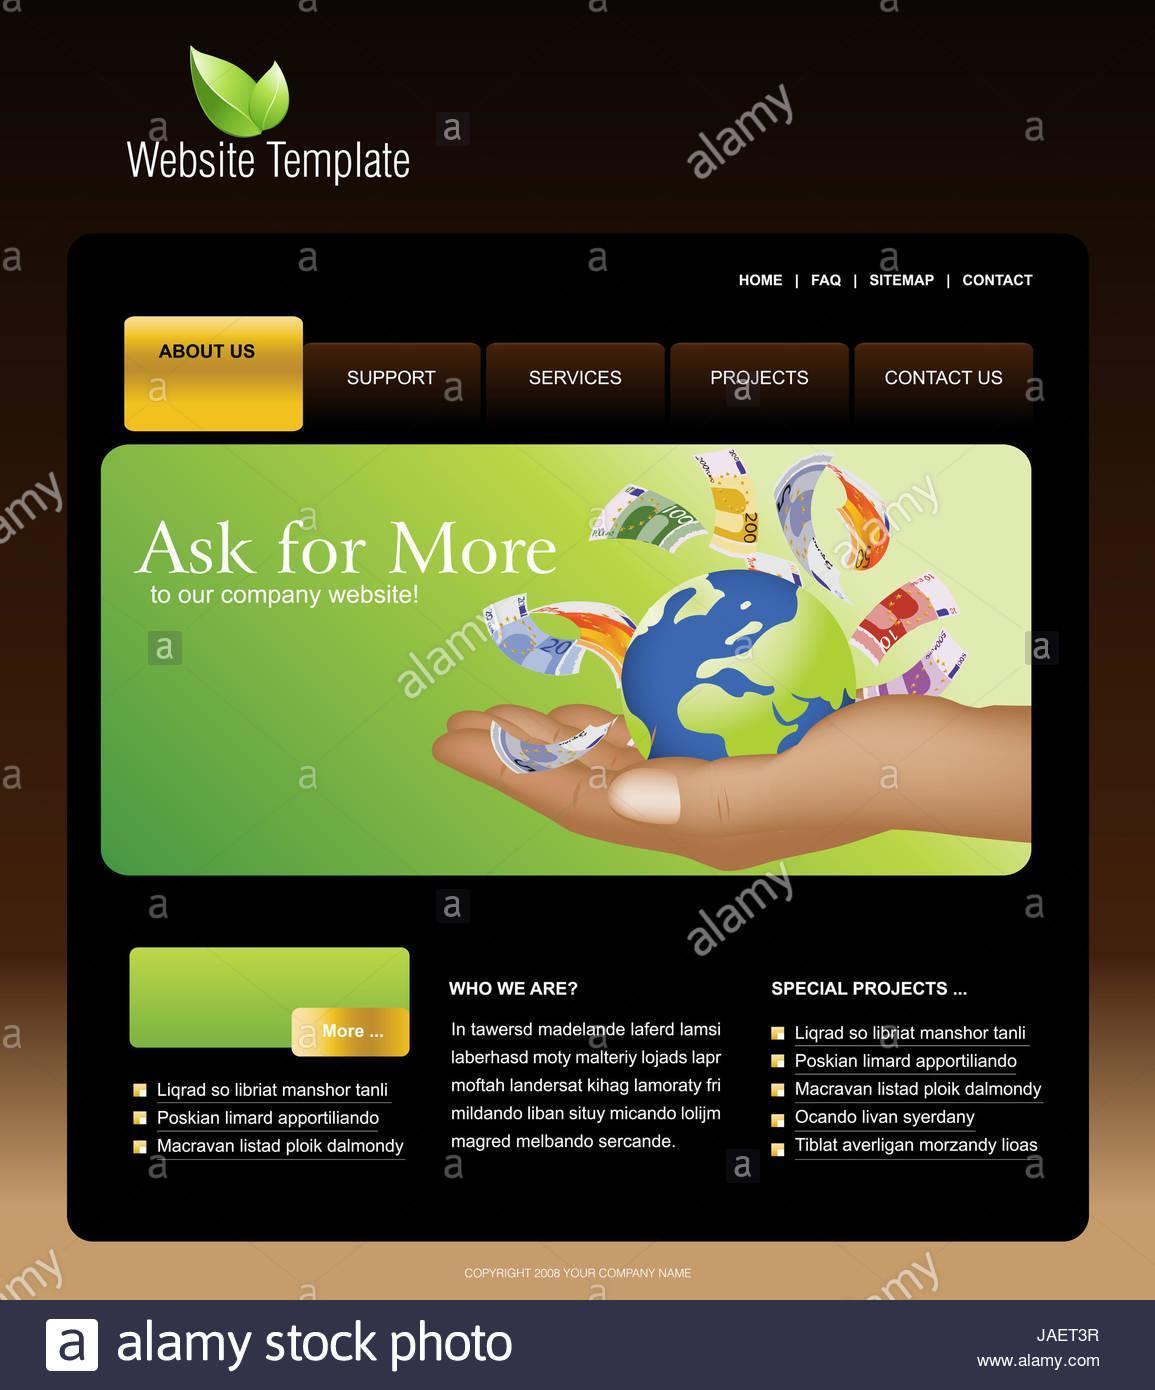 Adobe Illustrator Website Templates